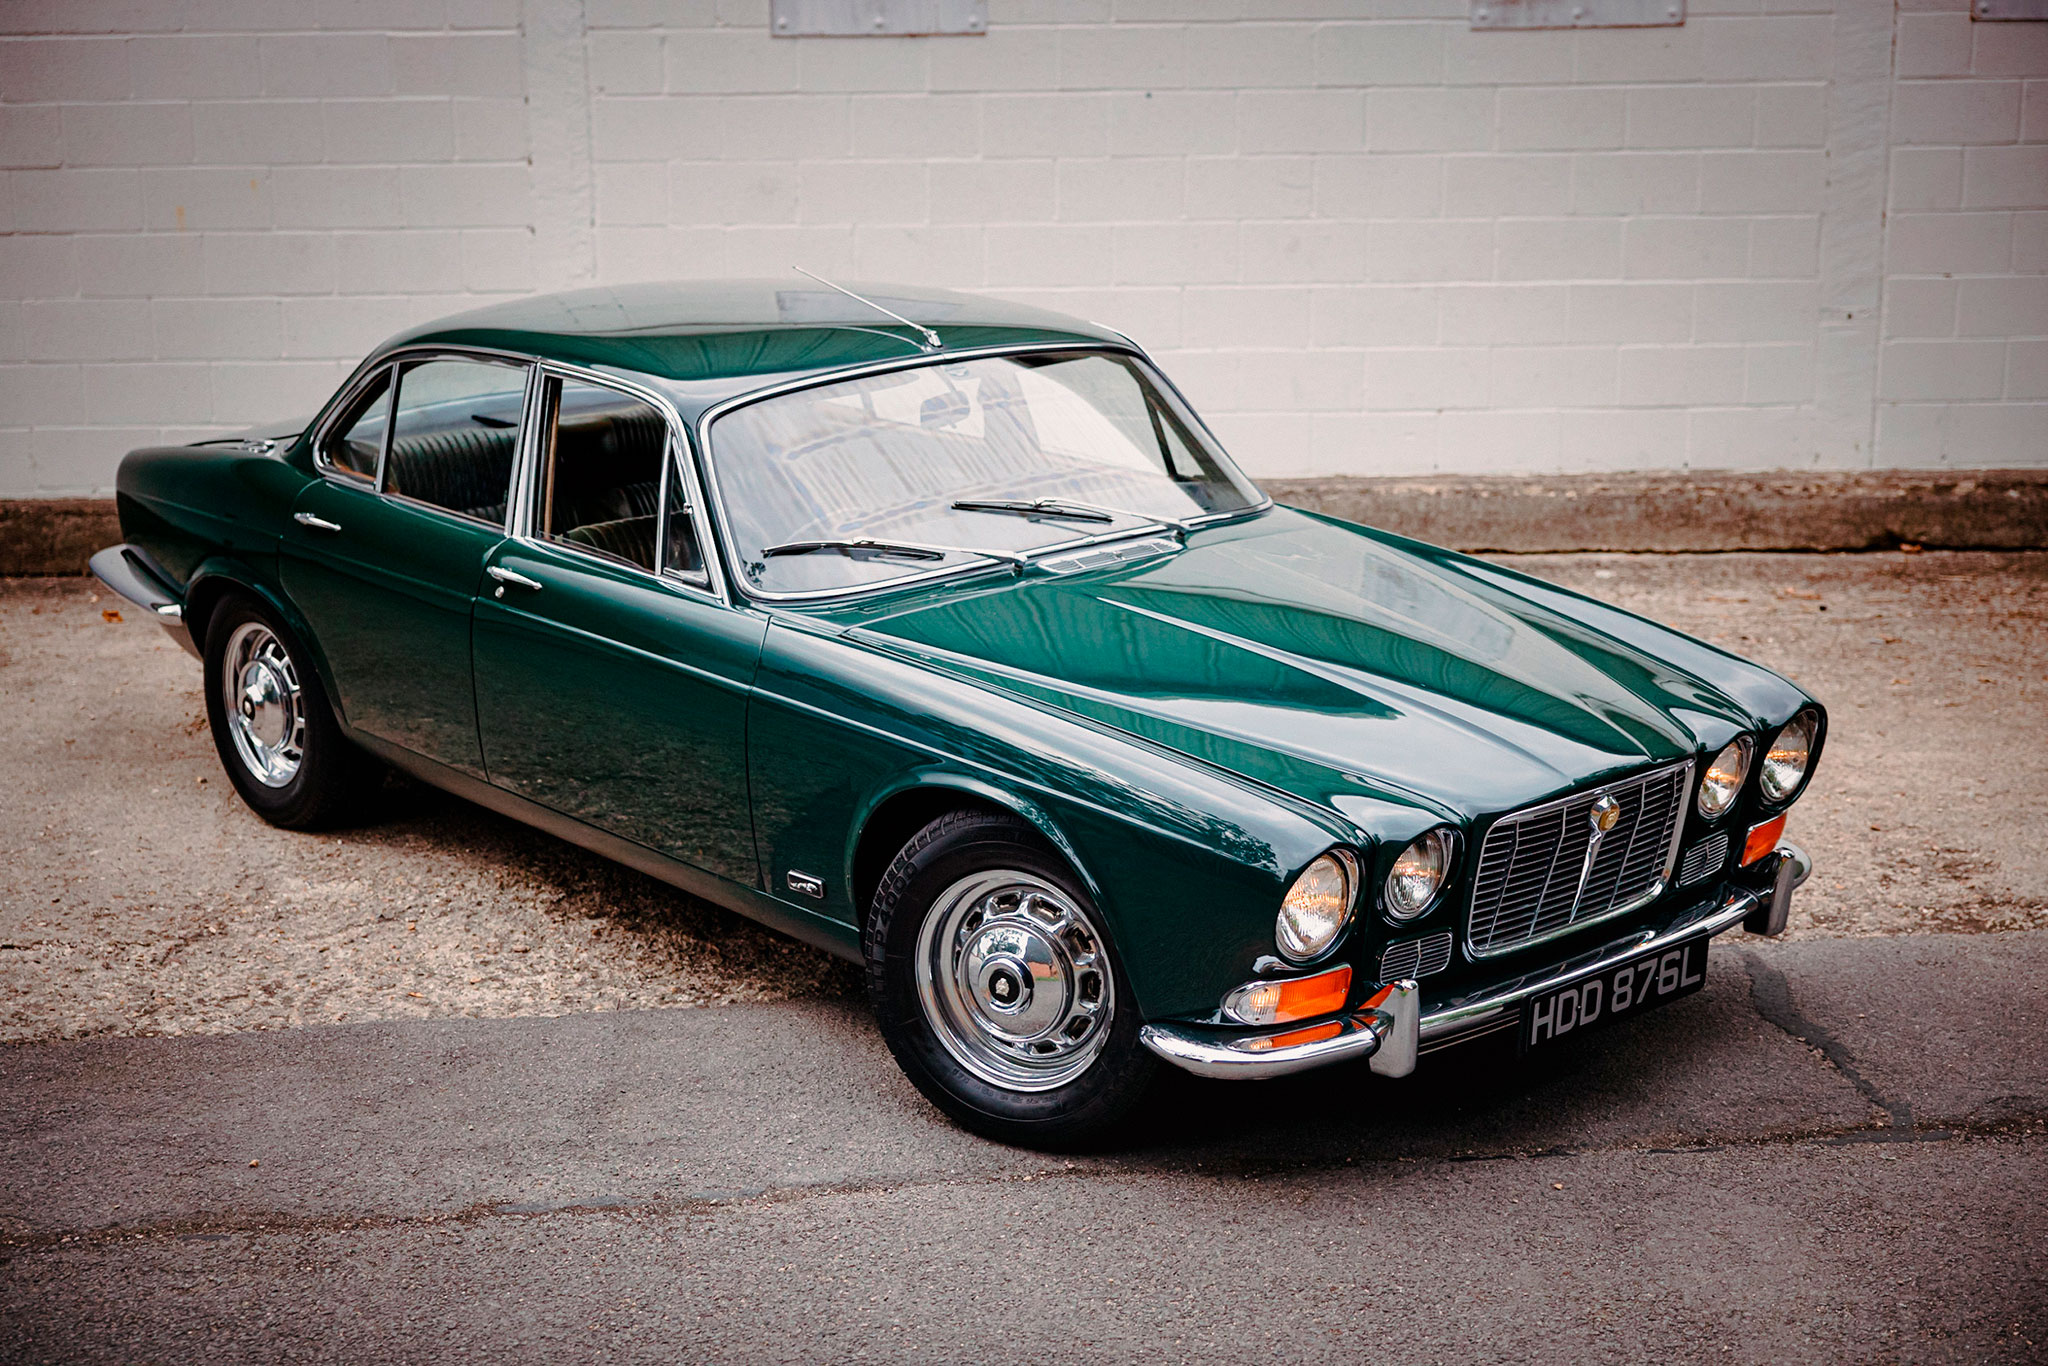 1973 Jaguar XJ6 S1 Saloon - The Market by Bonhams.